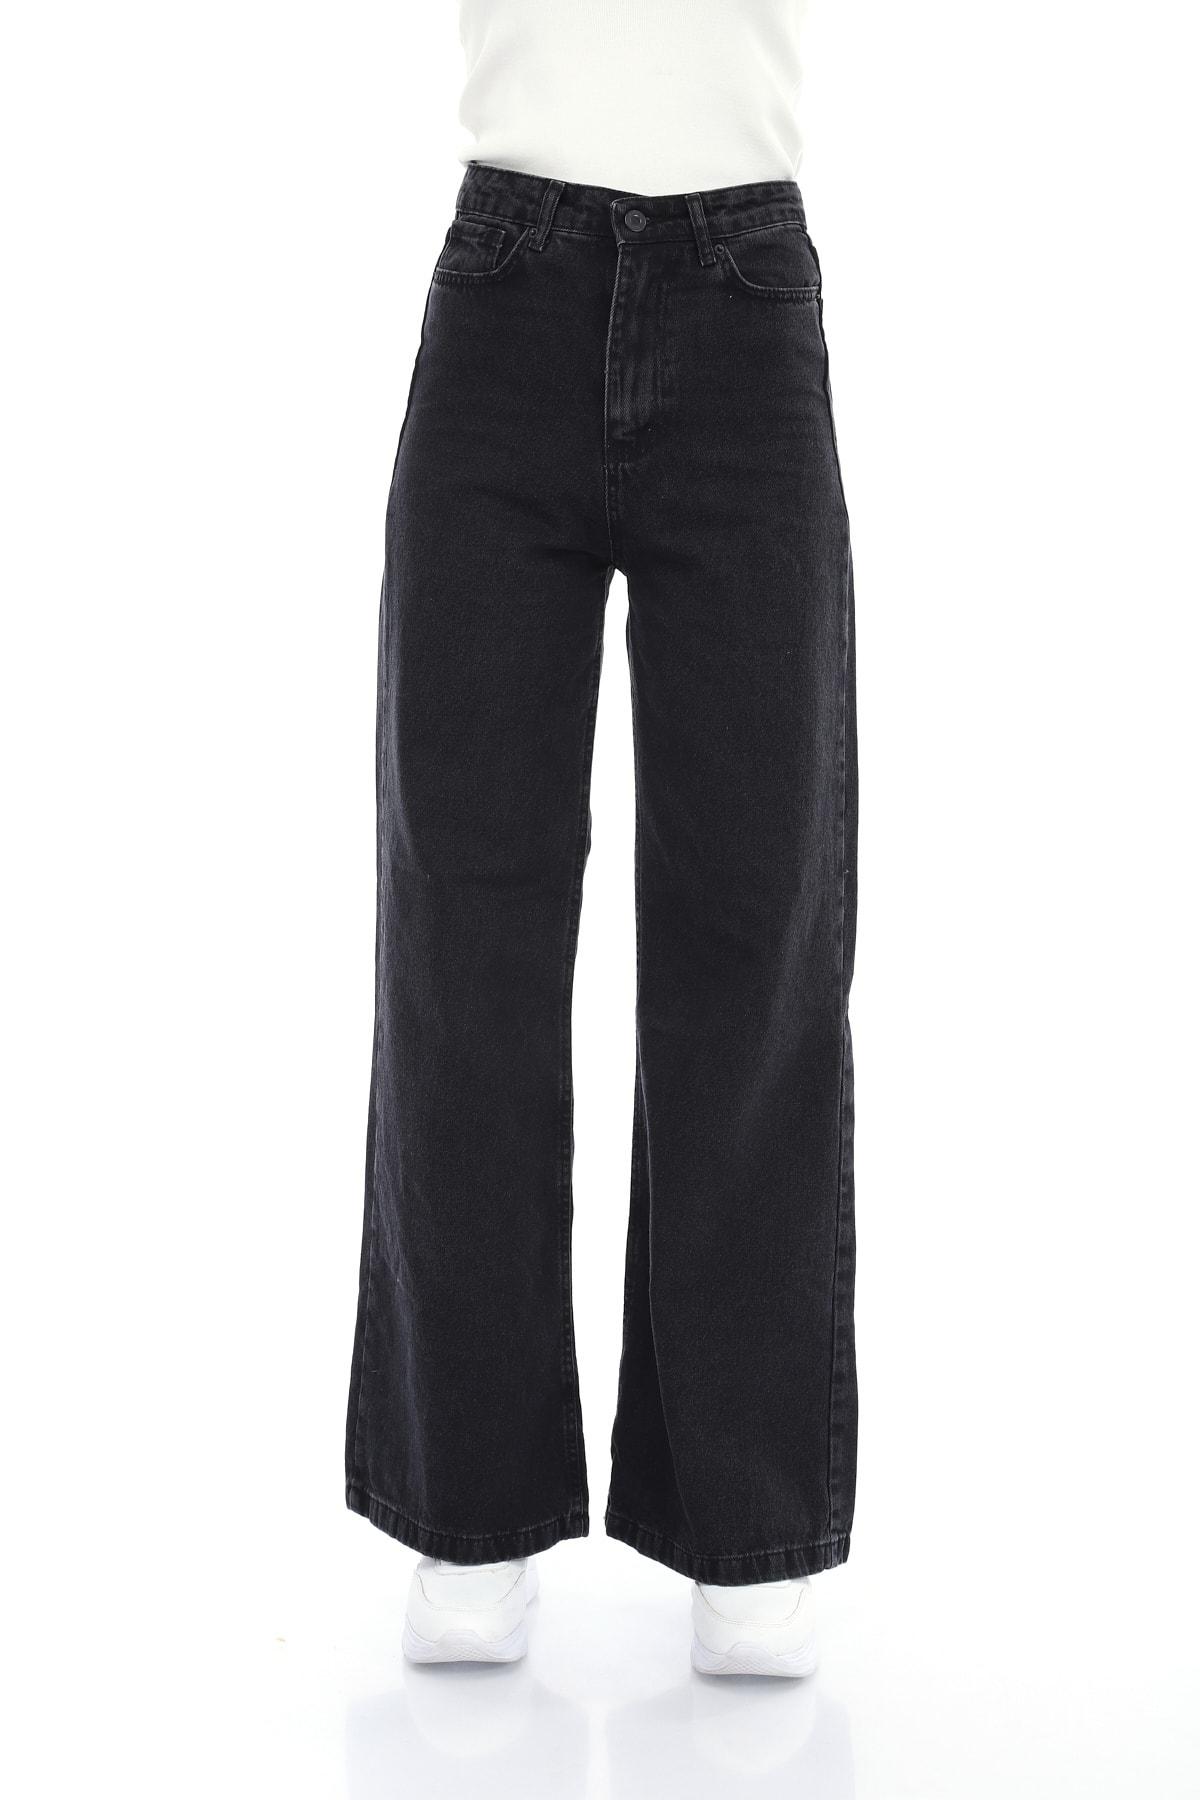 Füme Bol Paça Jeans